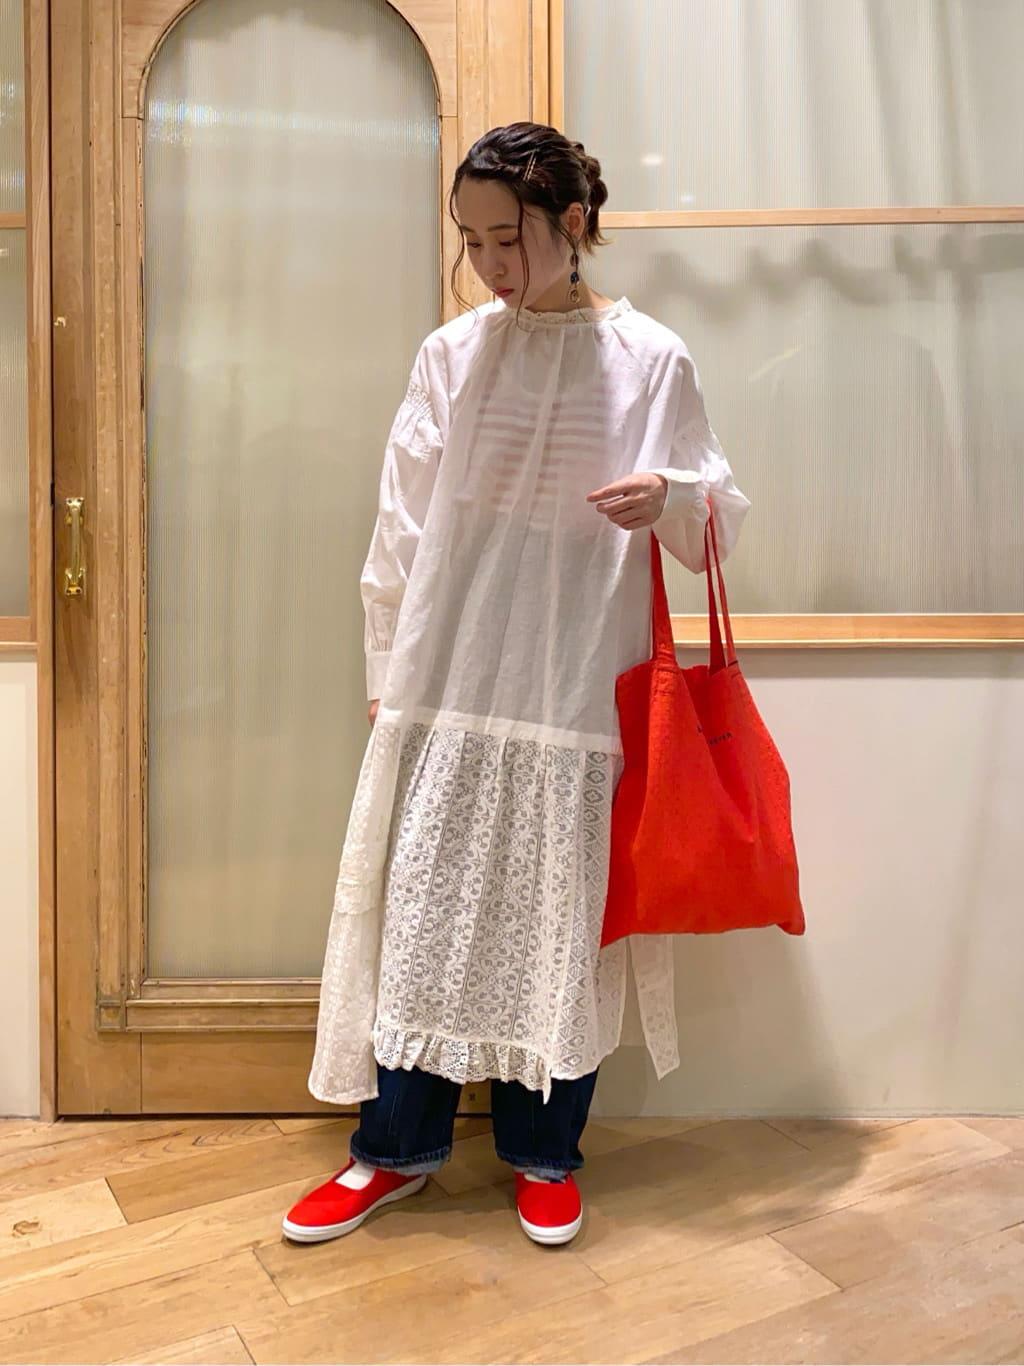 bulle de savon 新宿ミロード 身長:157cm 2021.08.24